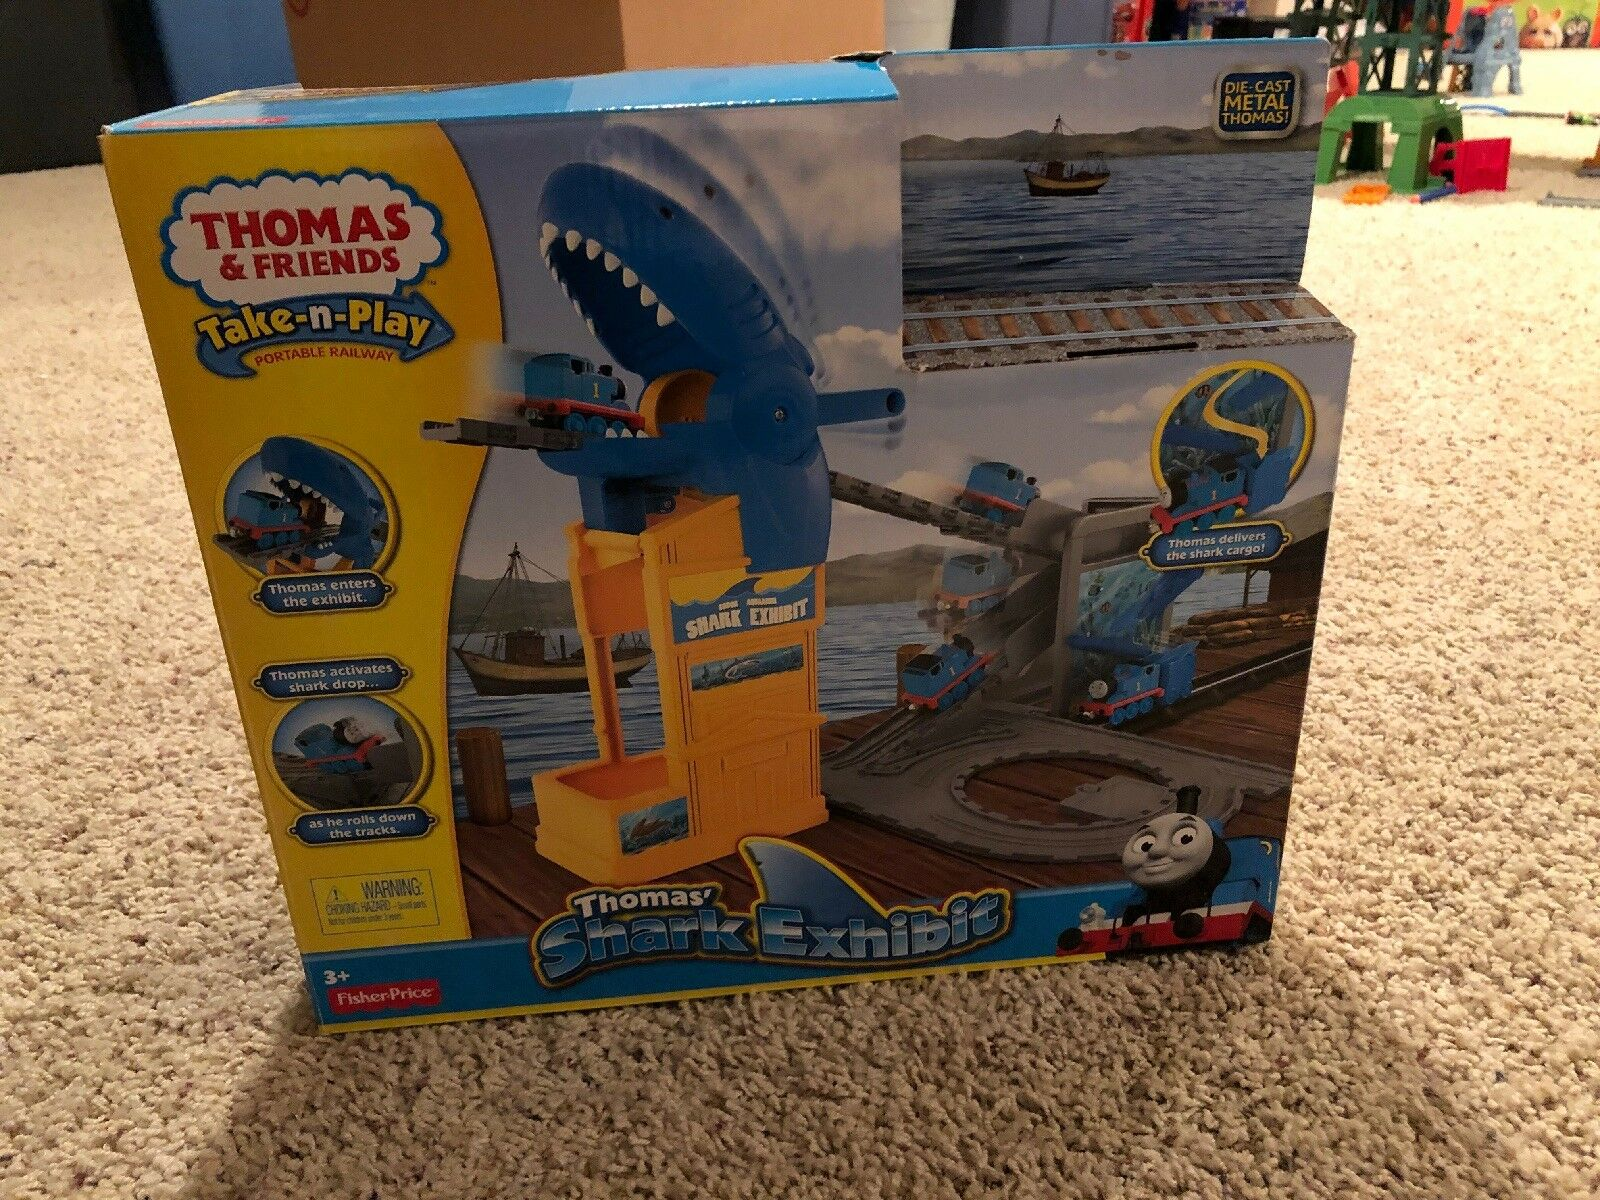 Fisher Fisher Fisher - price thomas & friends take-n-play thomas